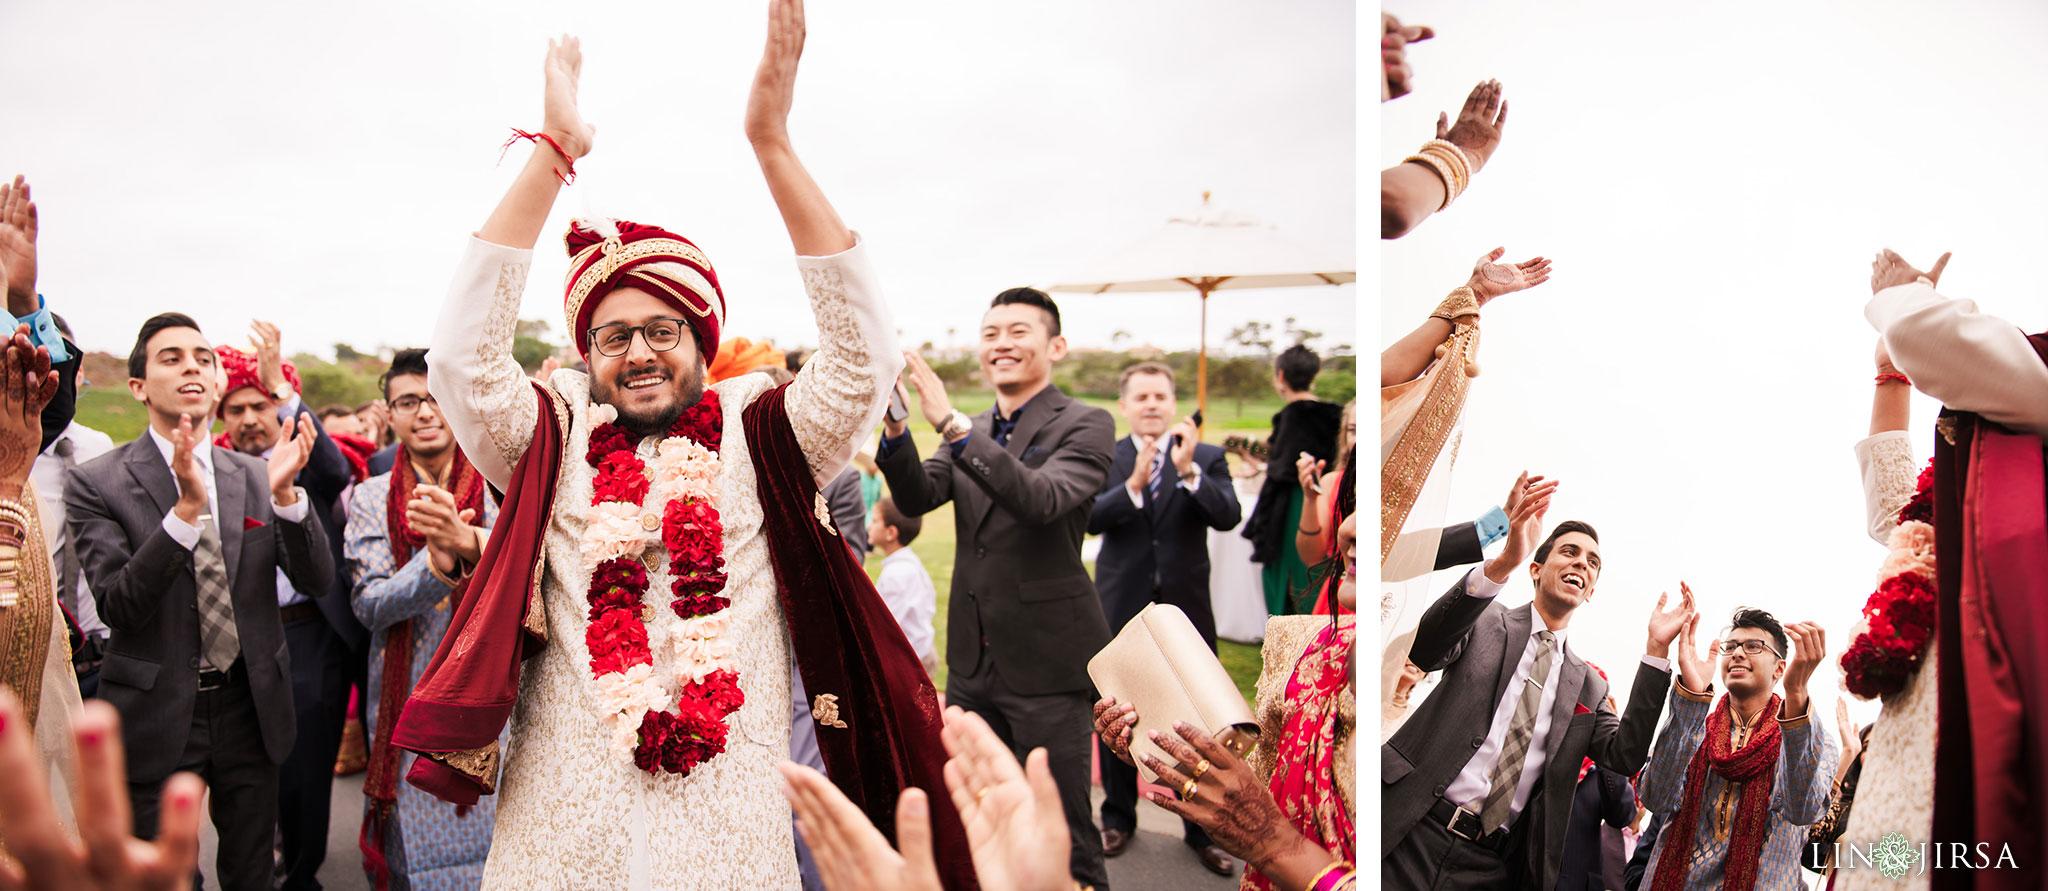 014 monarch beach resort dana point indian wedding baraat photography